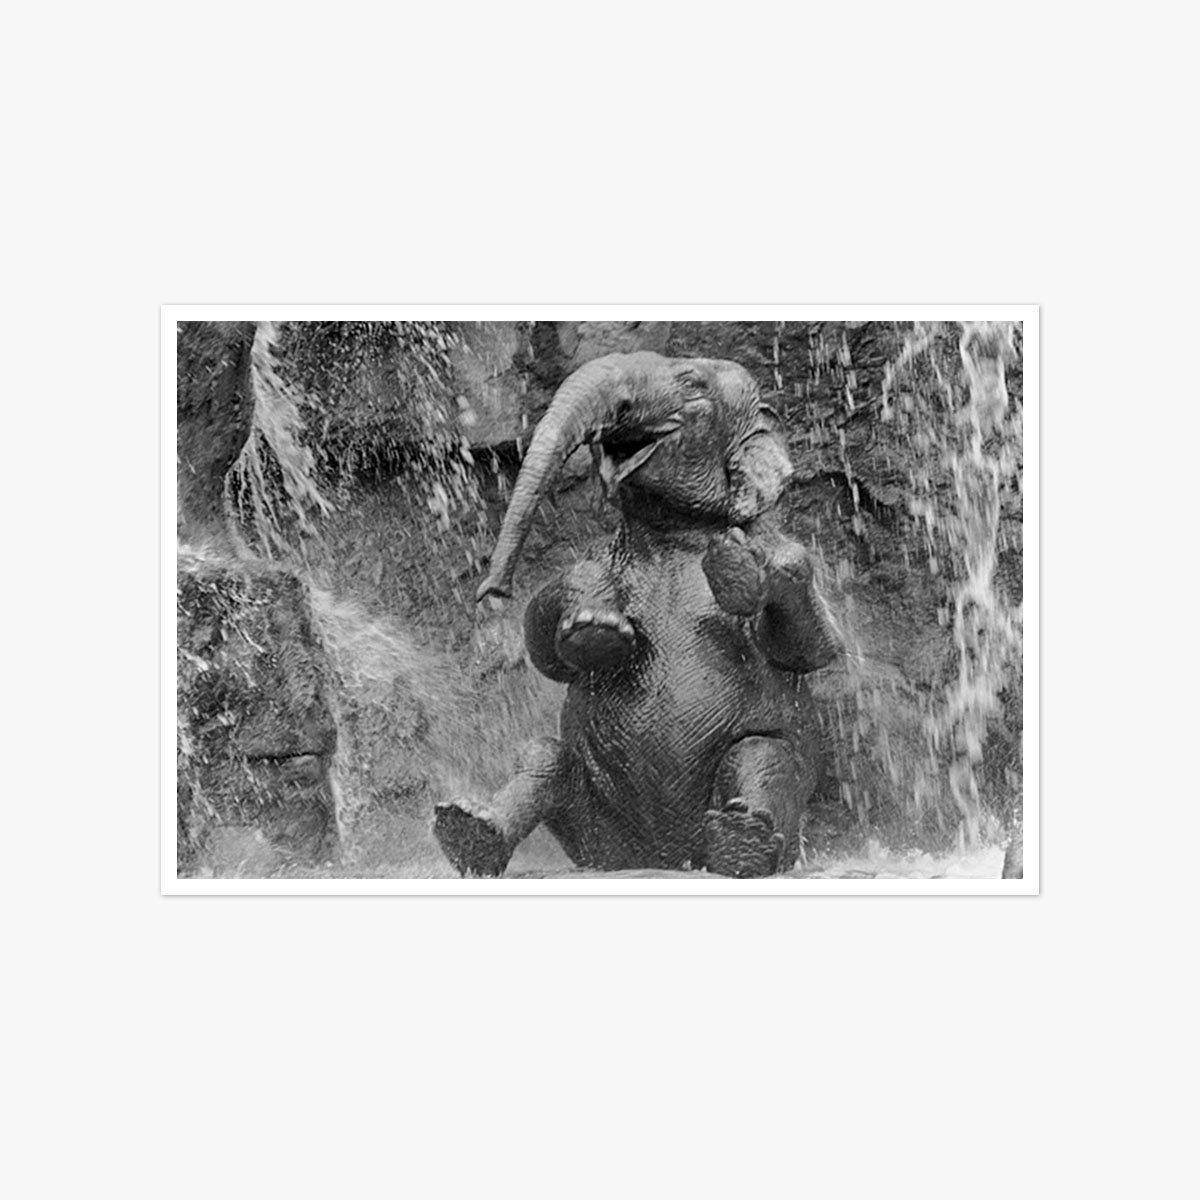 Elephant Ablutions by Harry Benson